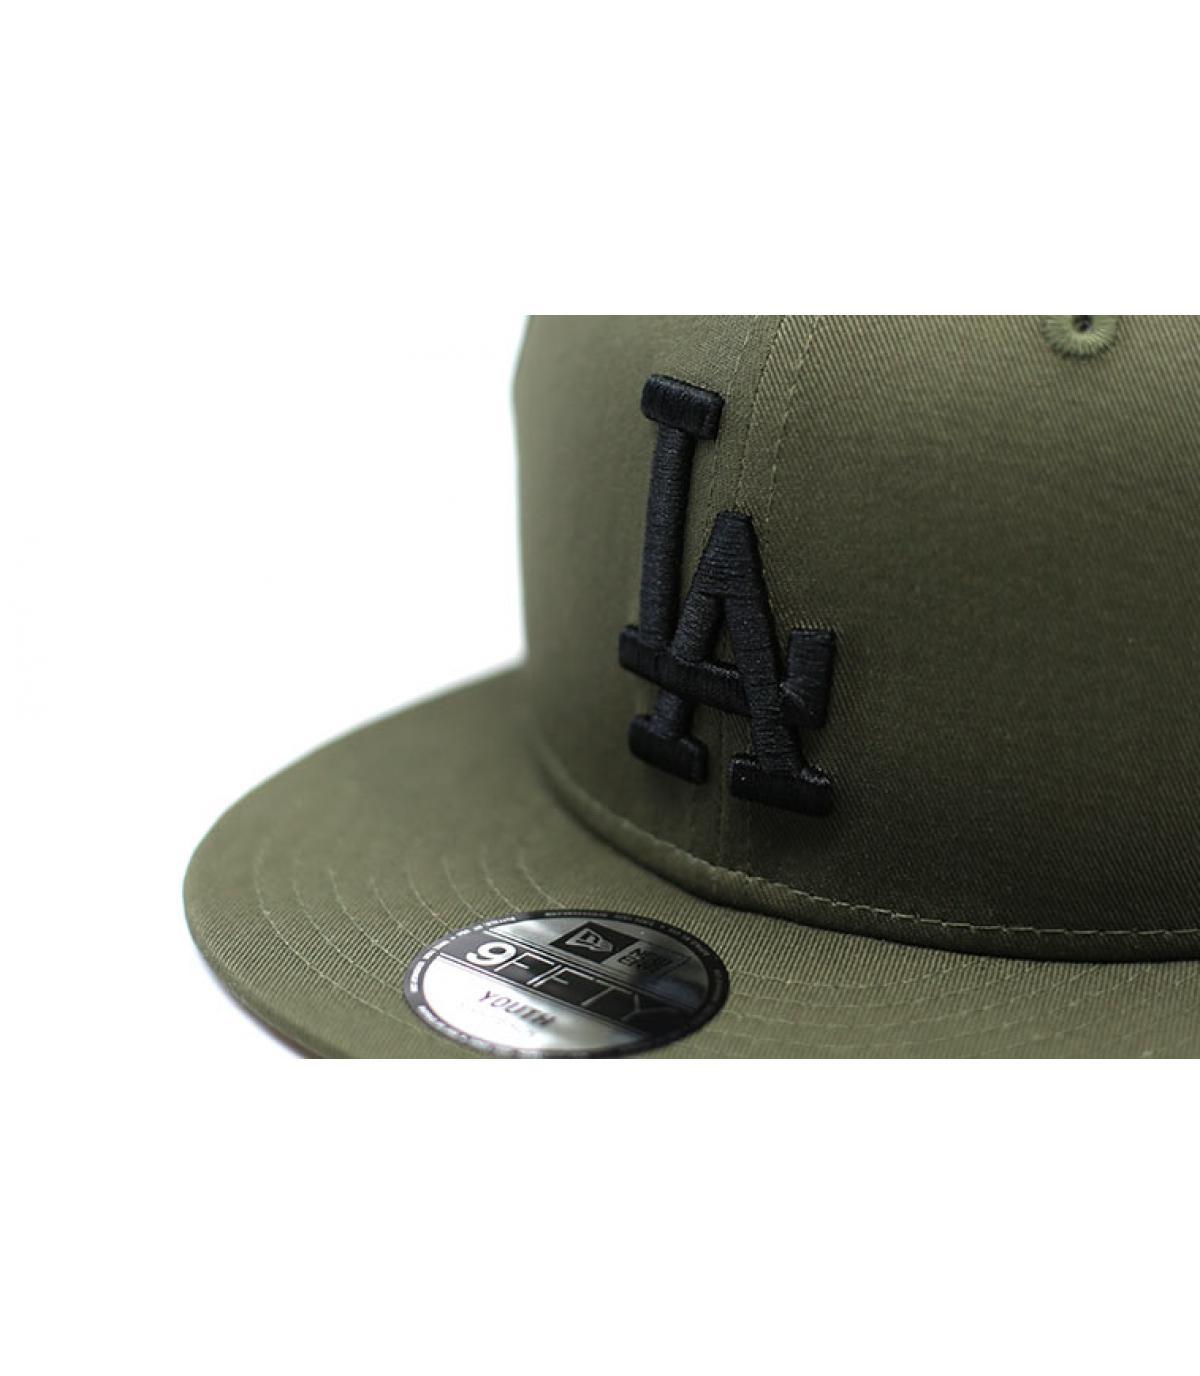 Details Snapback League Ess LA 9Fifty black olive black - Abbildung 3